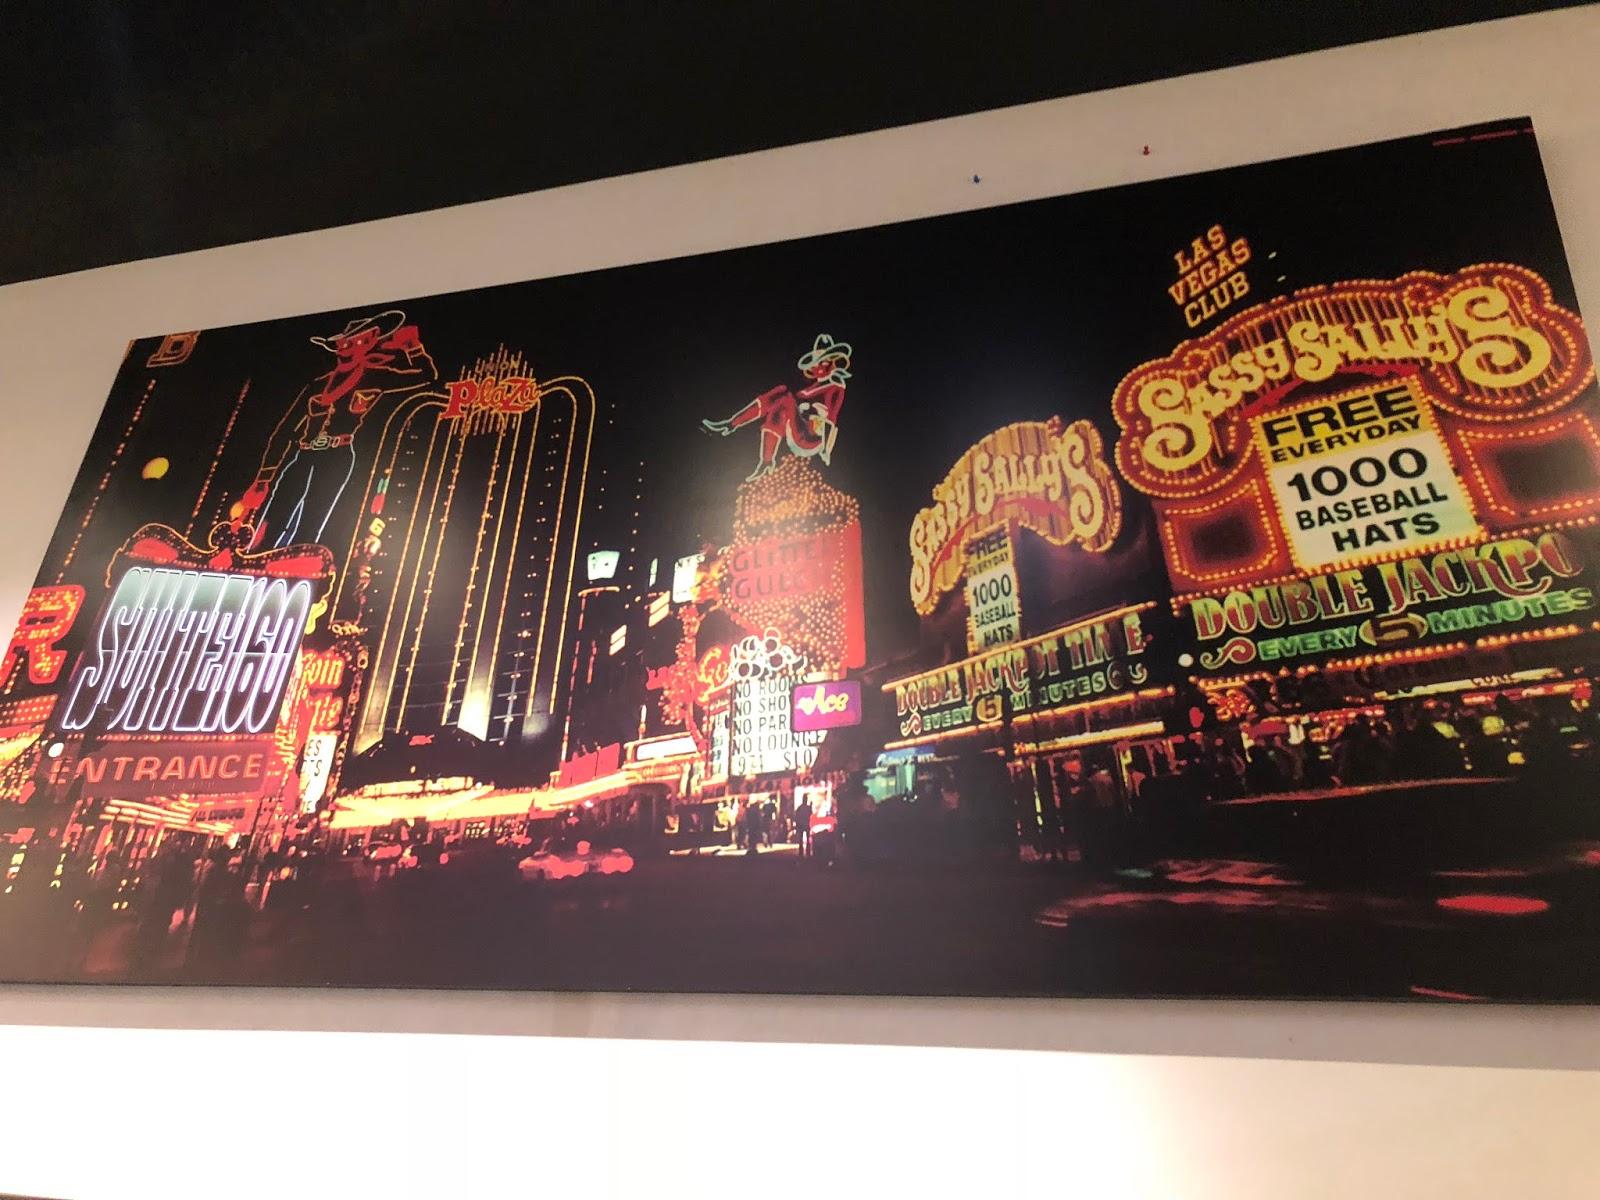 Suite160 Las Vegas